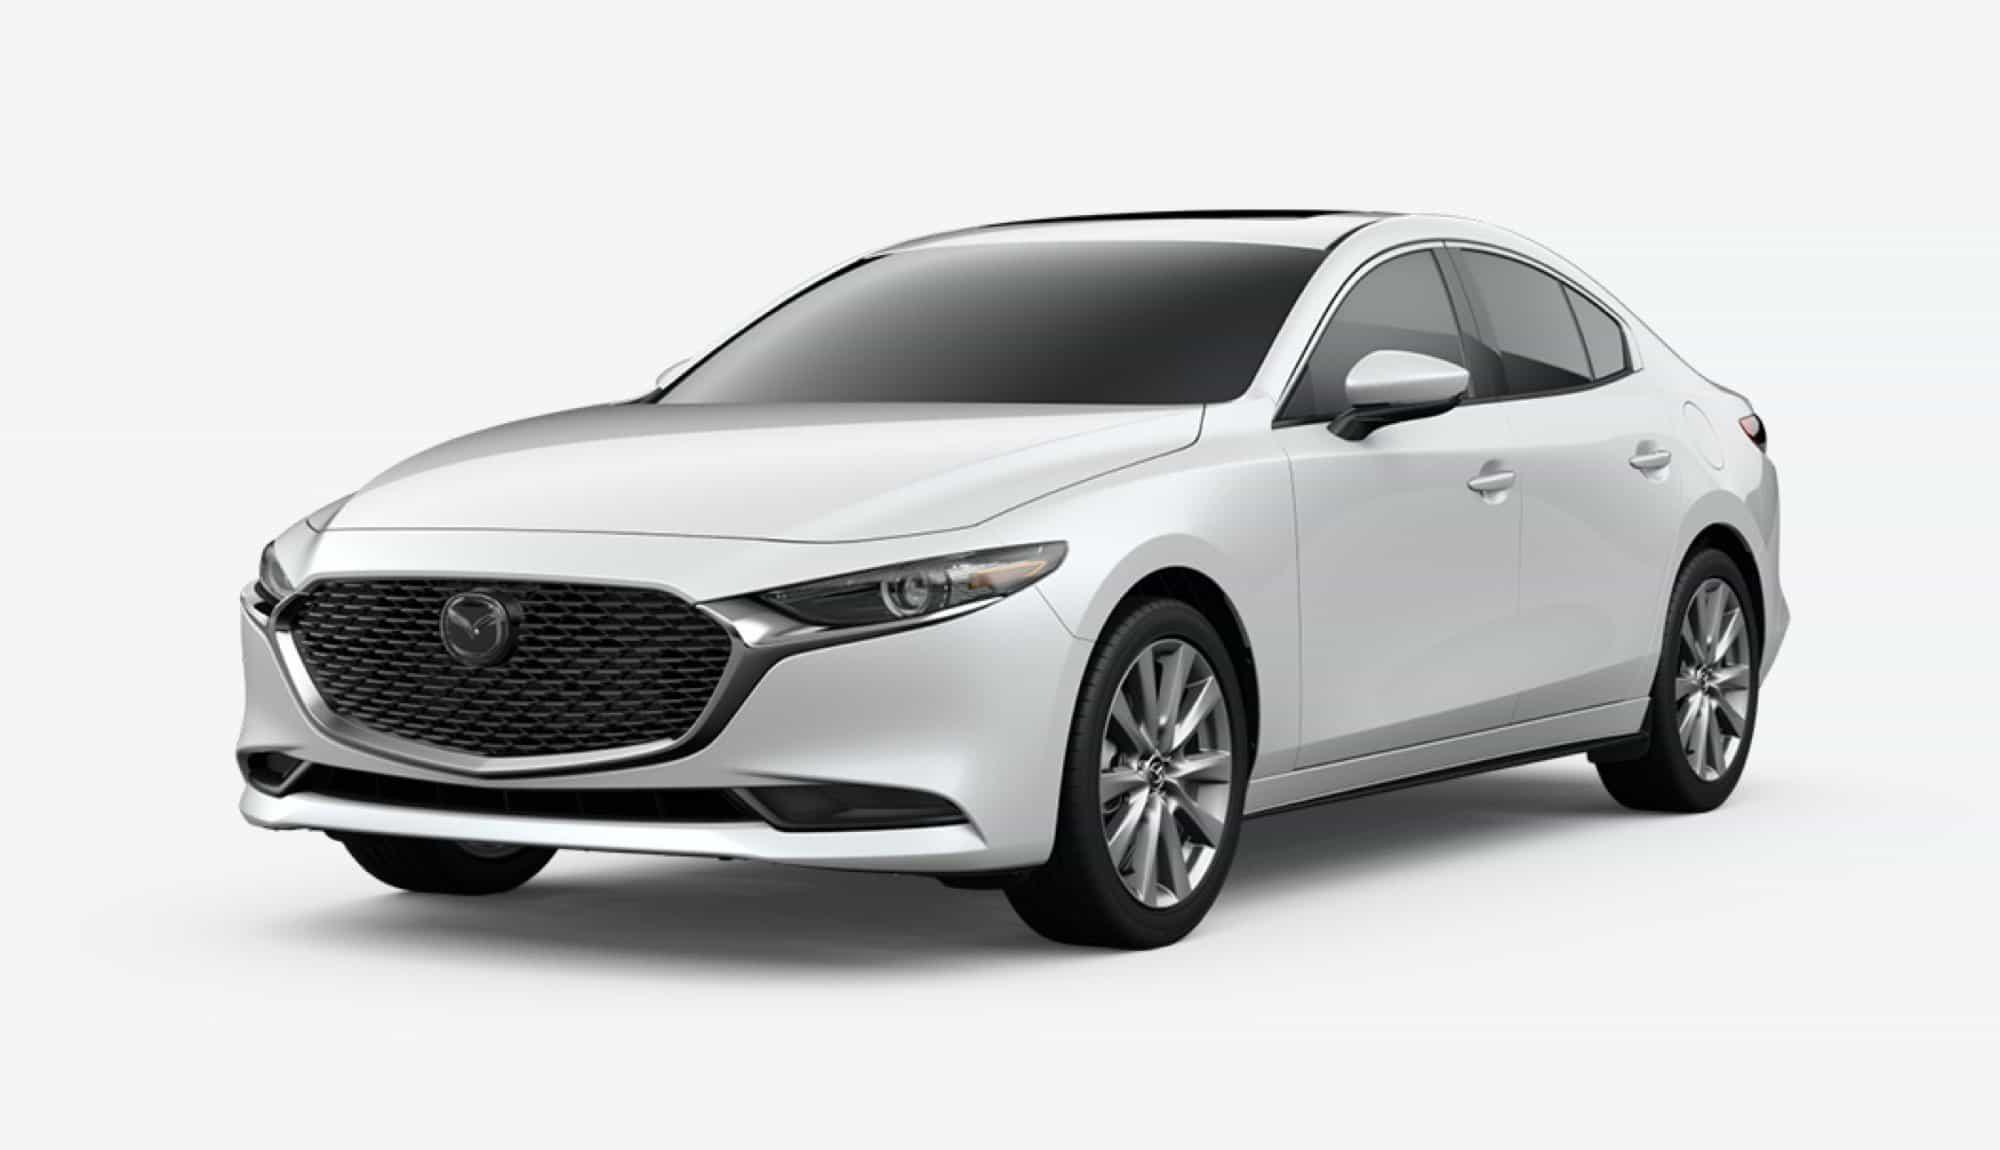 2020 Mazda3 Sedan, Snowflake White Pearl Mica